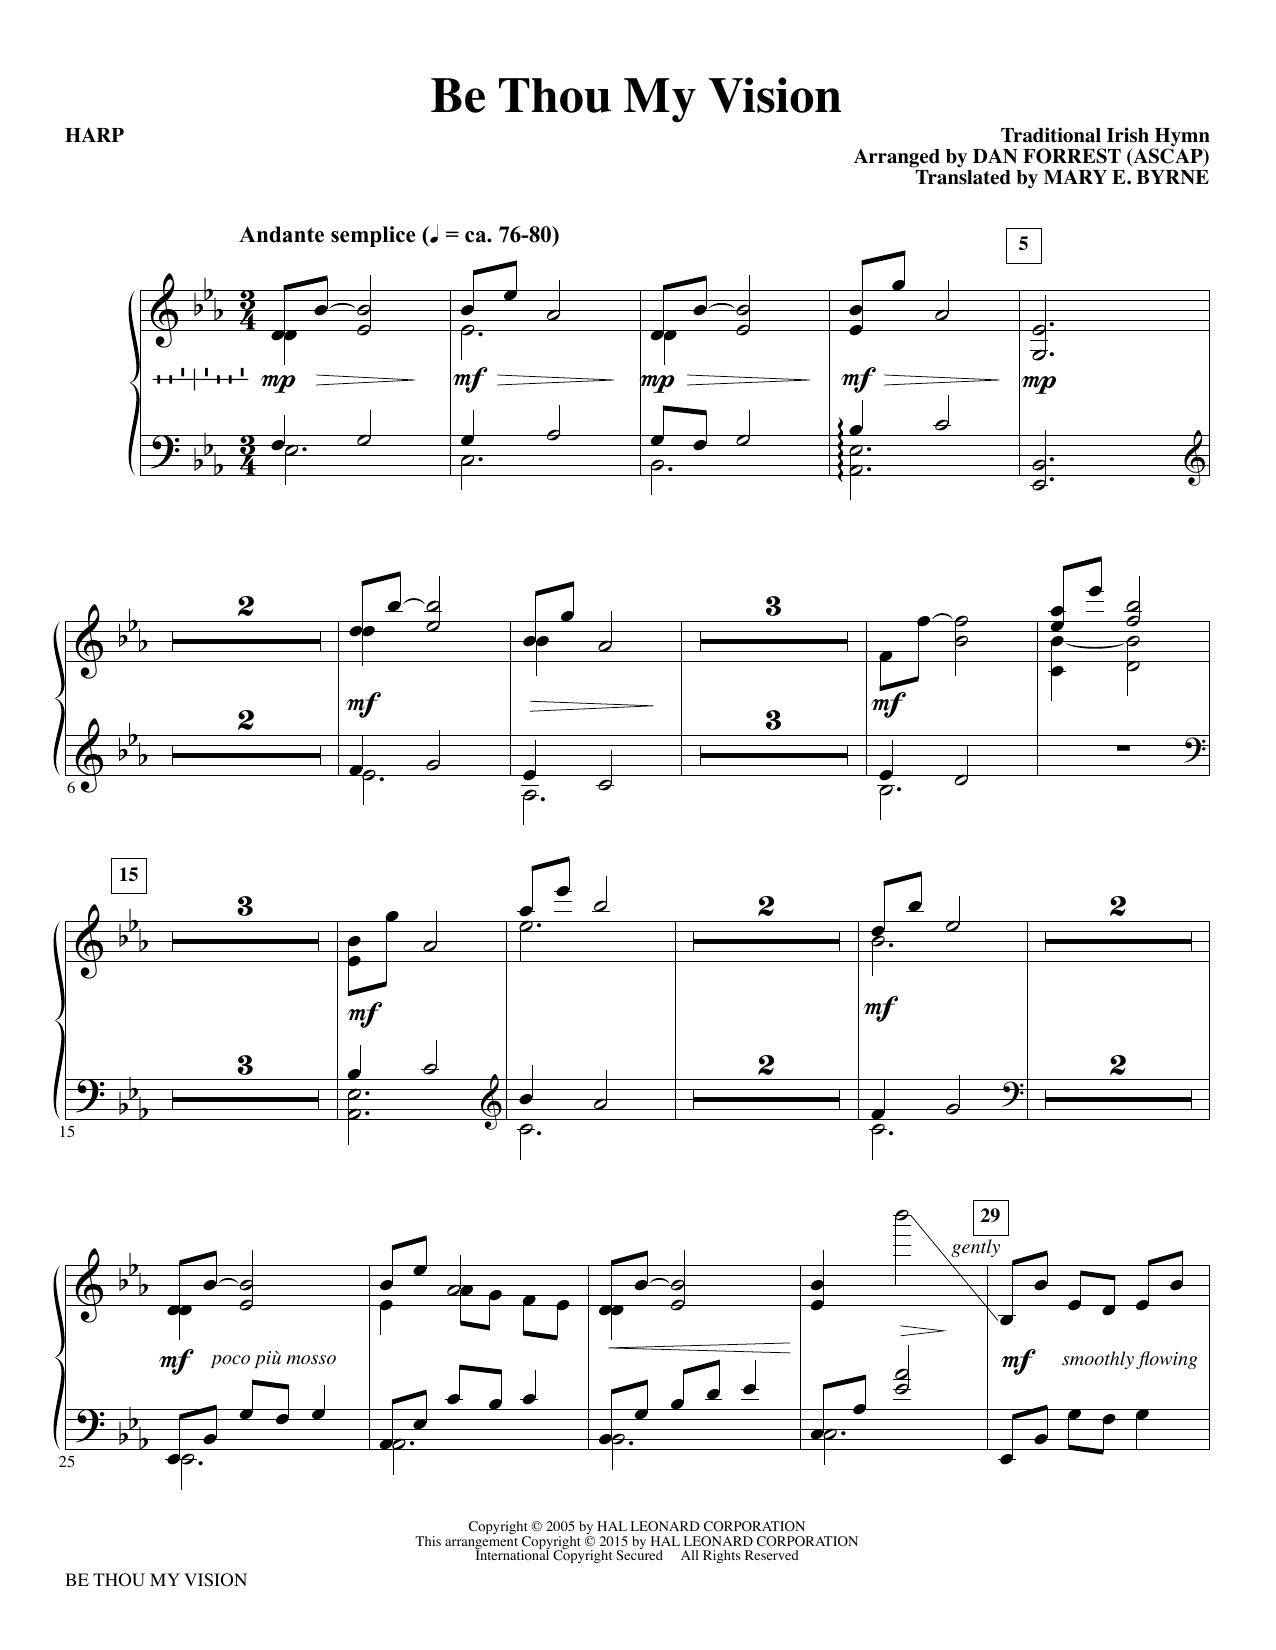 Be Thou My Vision - Harp sheet music